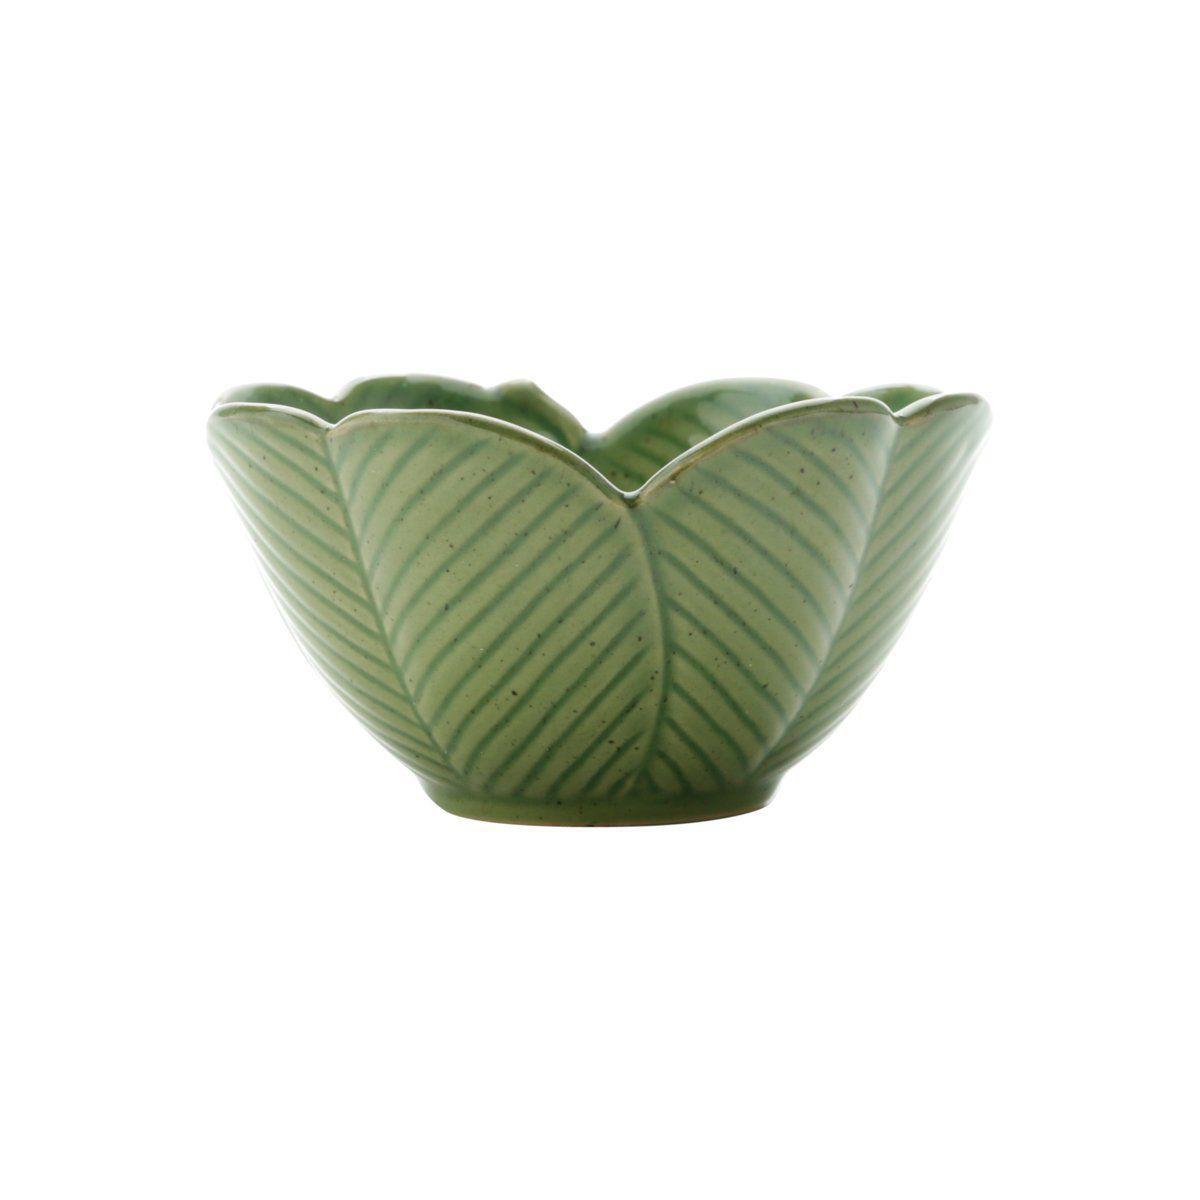 Centro de mesa 13 cm de cerâmica verde Banana Leaf Lyor - L4133